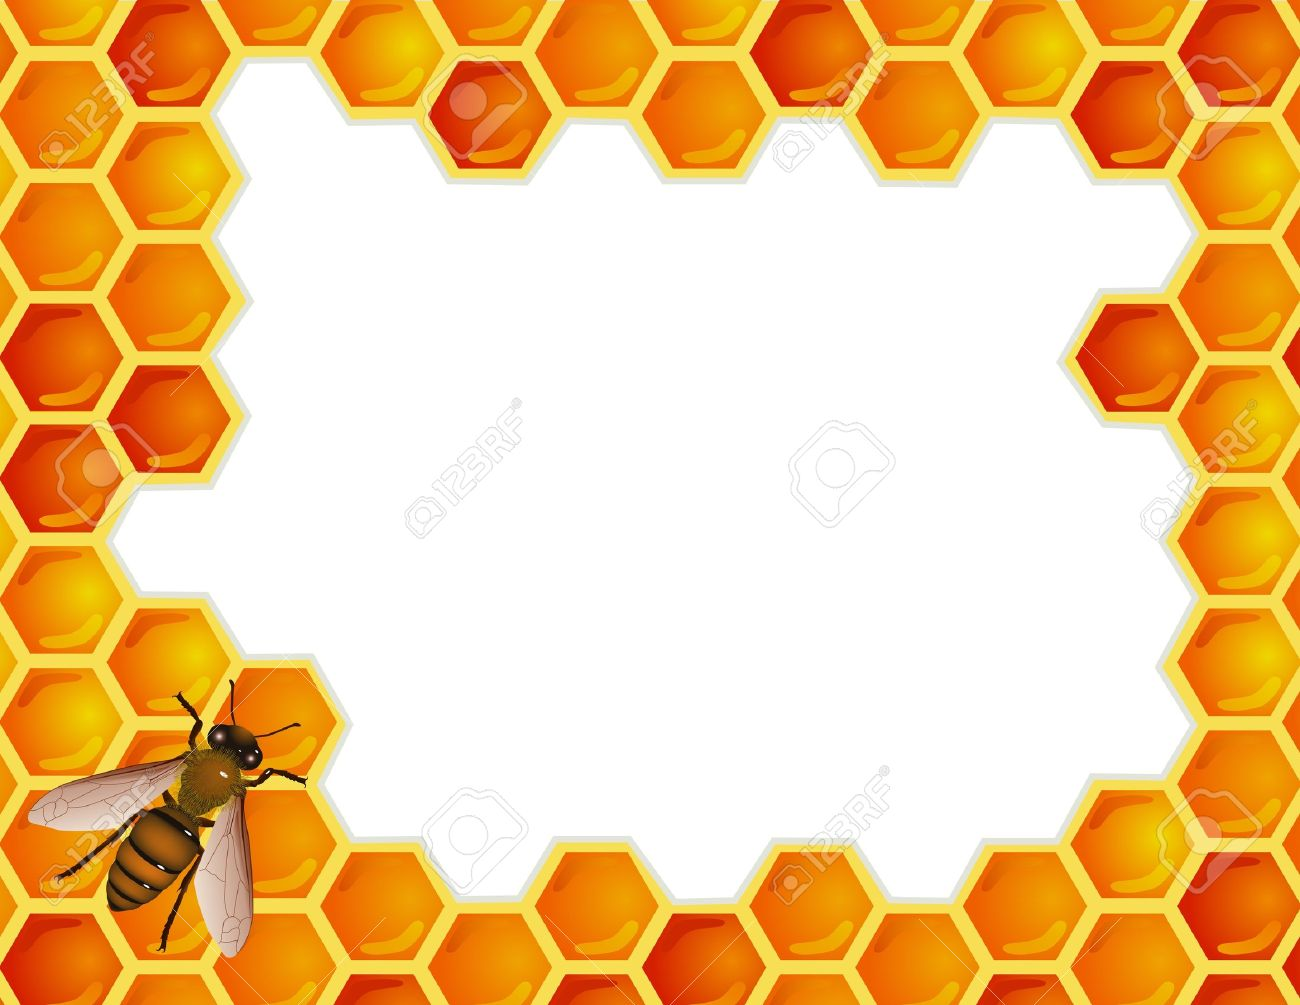 Bee with honey comb - 12152547